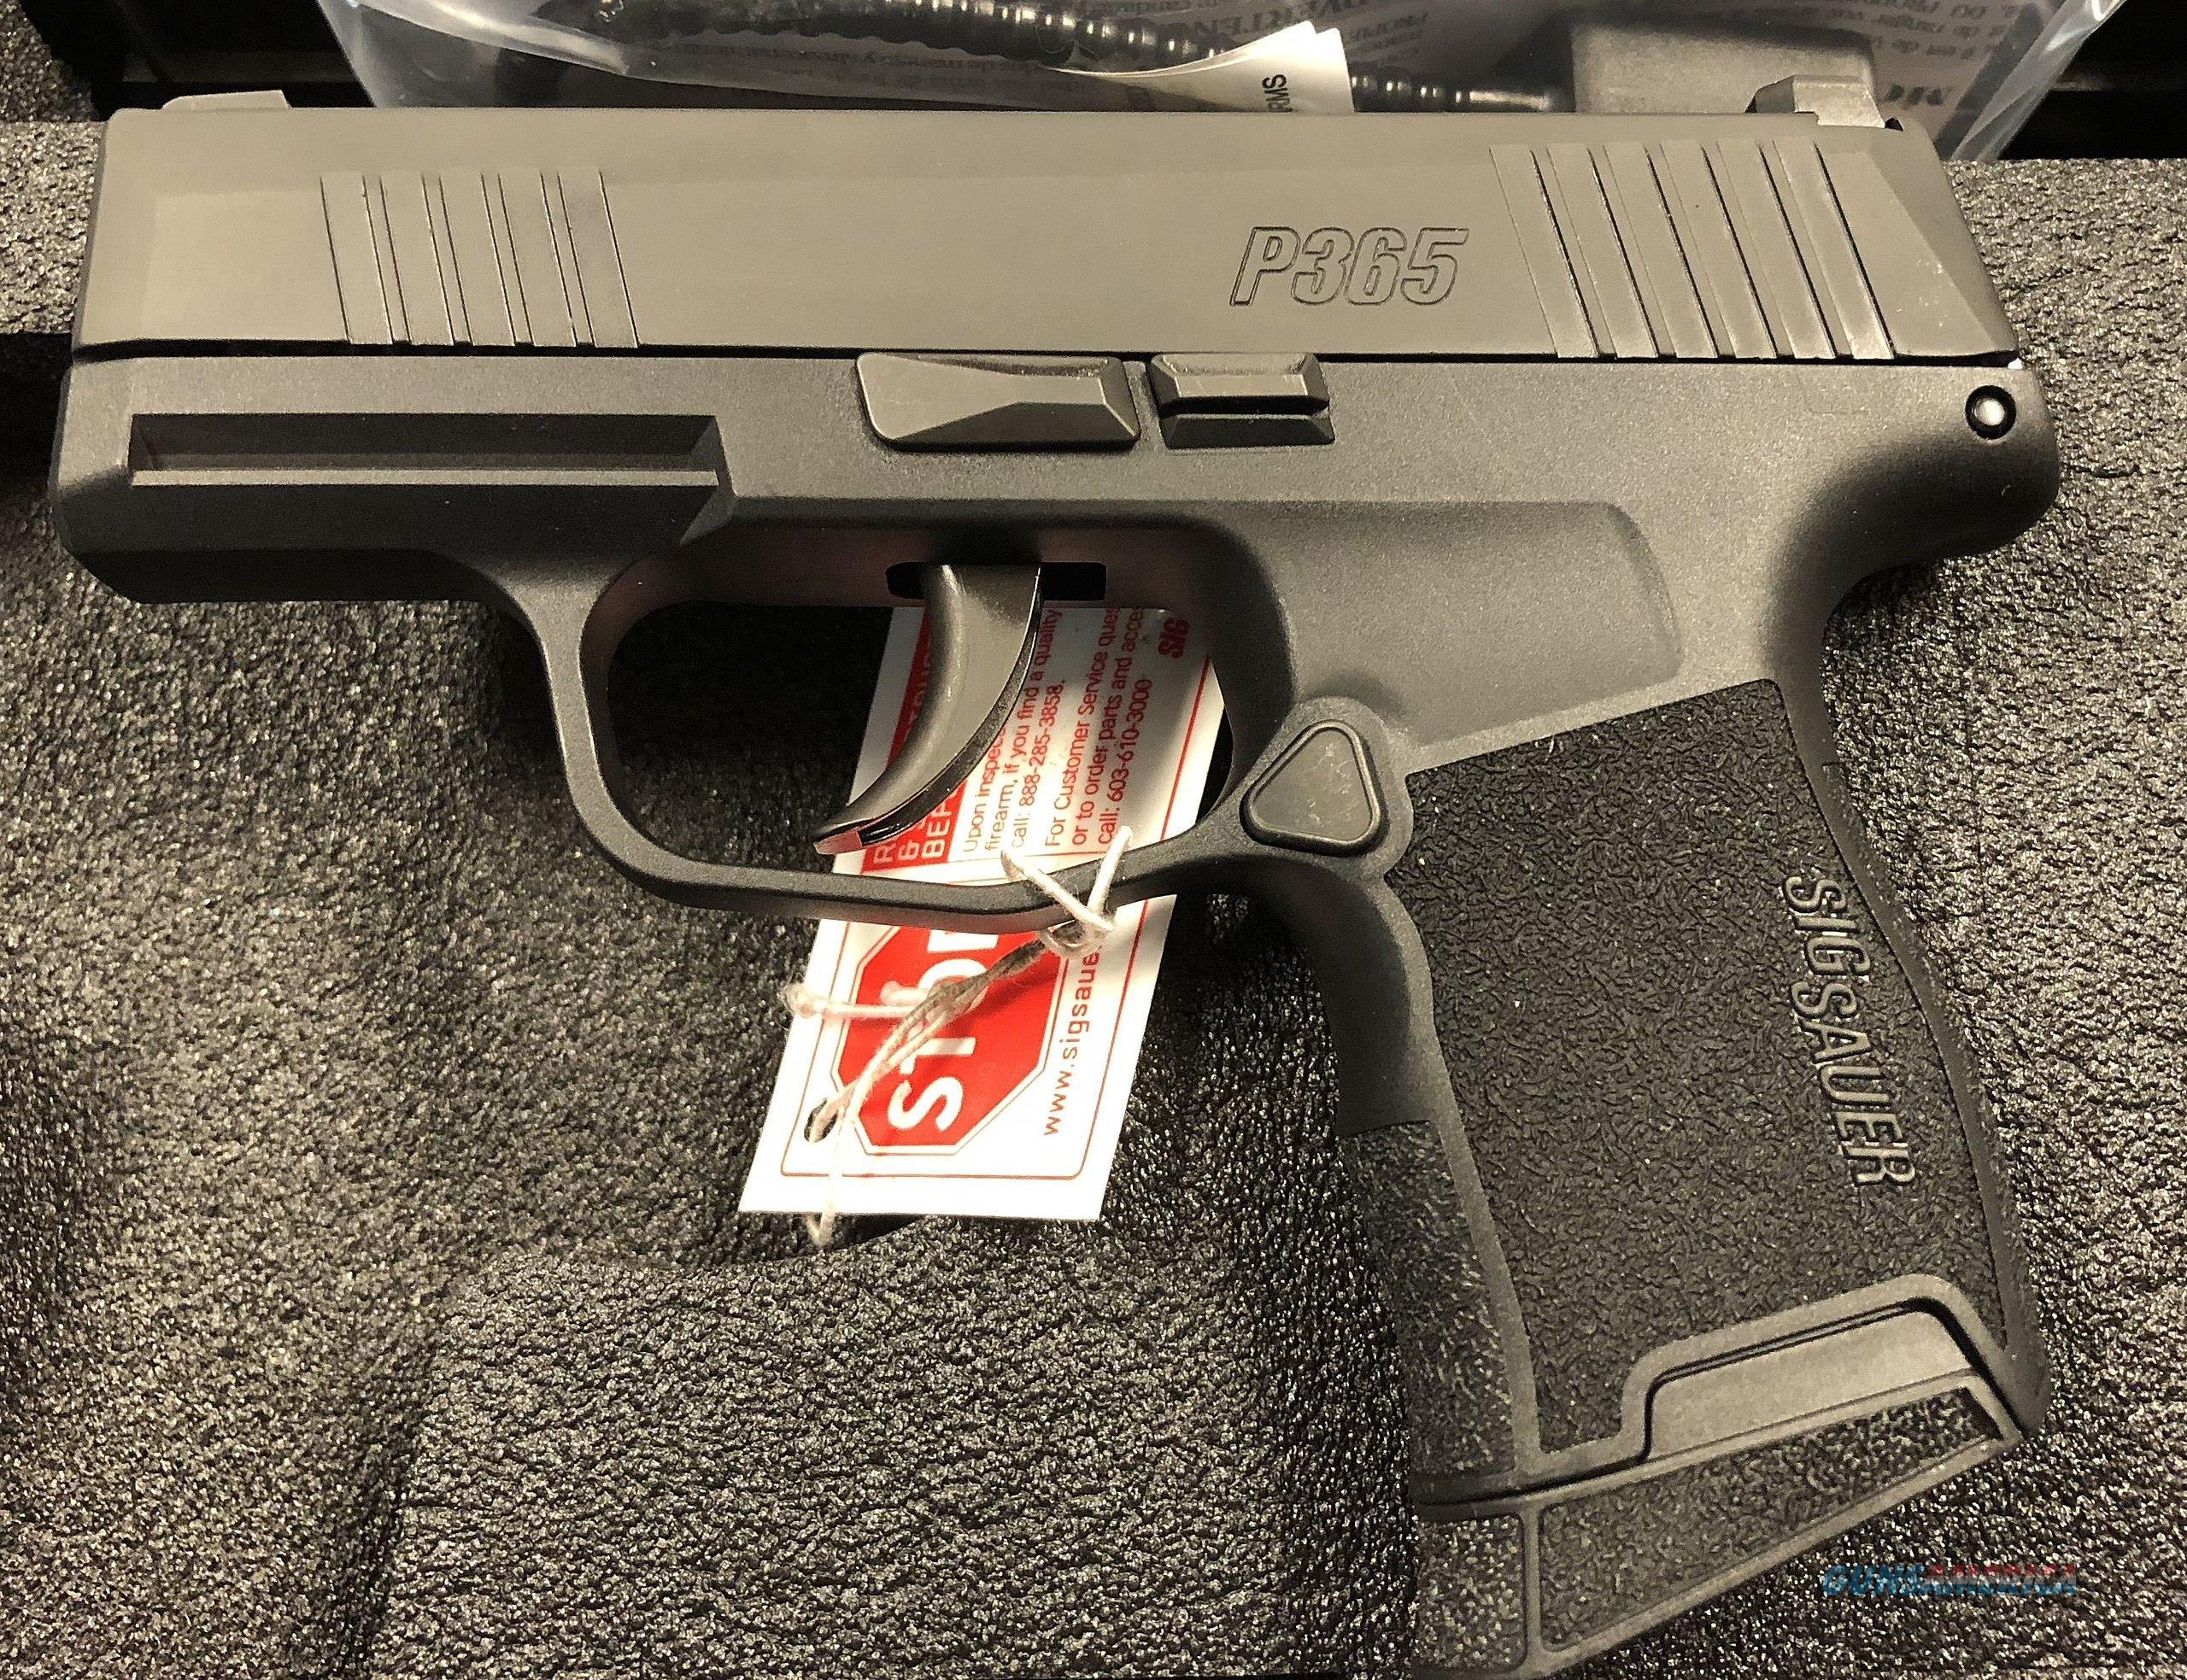 Sig Sauer P365 Micro-Compact   Guns > Pistols > Sig - Sauer/Sigarms Pistols > P365